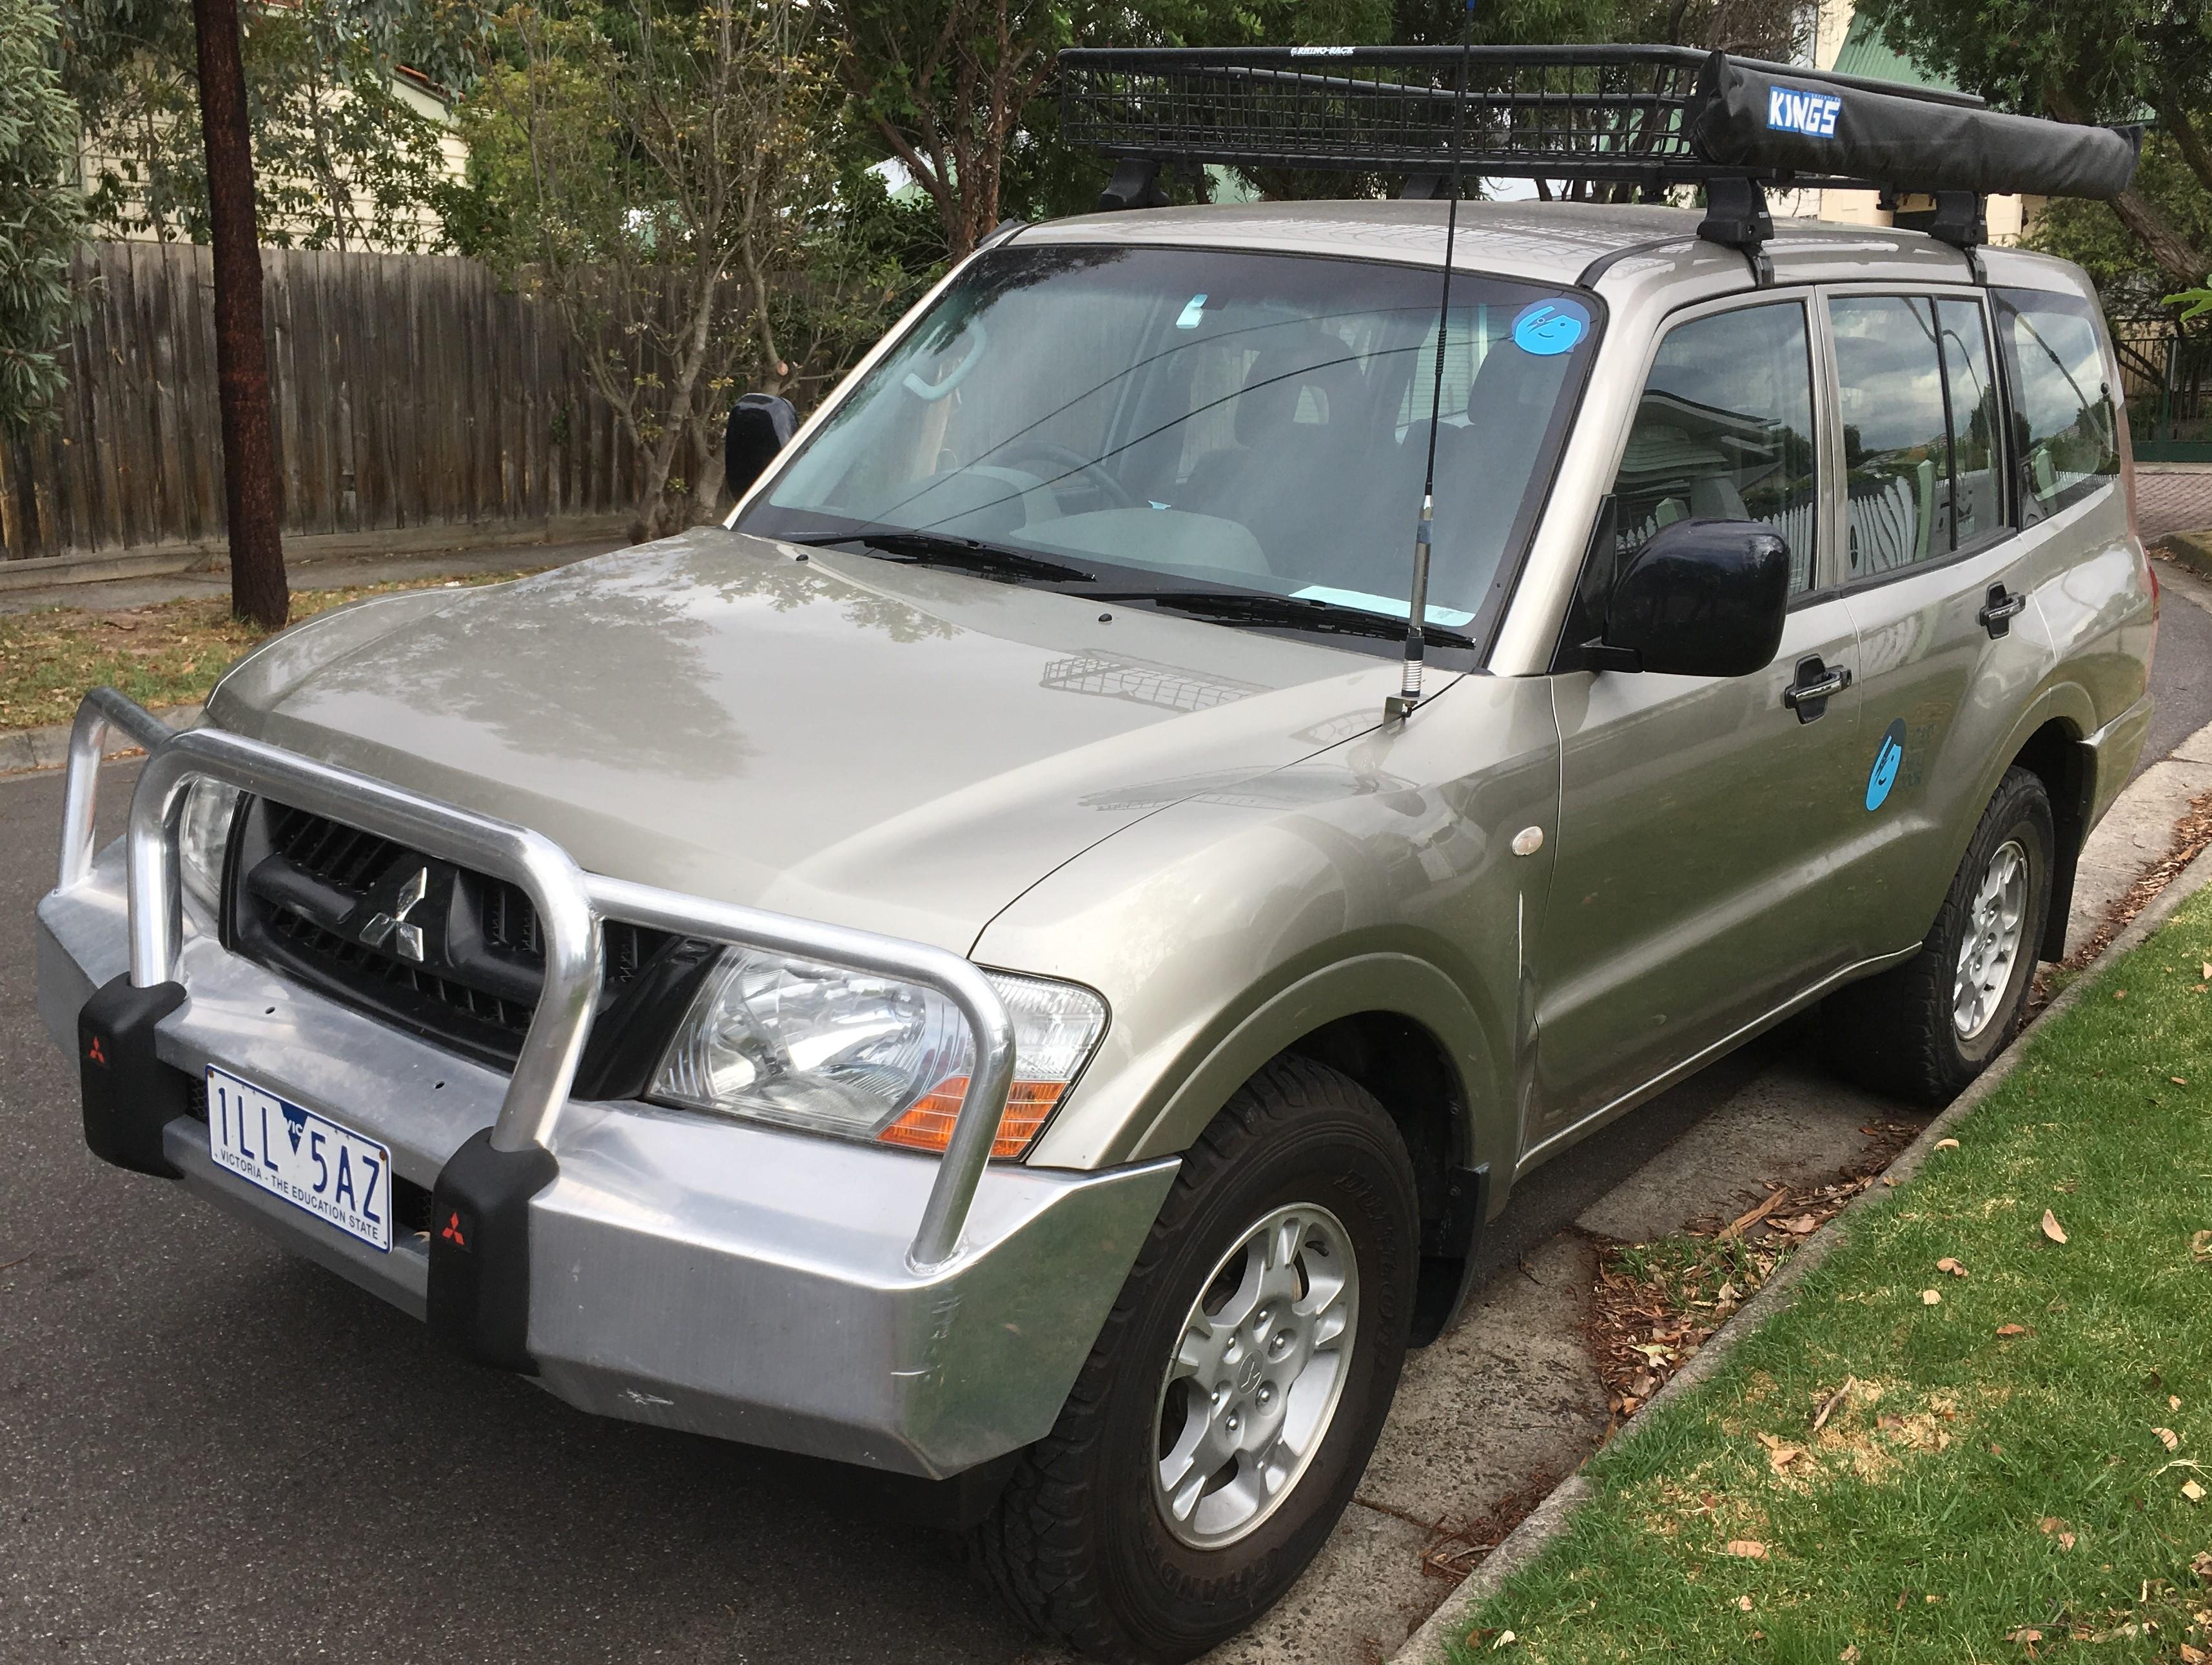 Picture of Kirsten's 2006 Mitsubishi Pajero